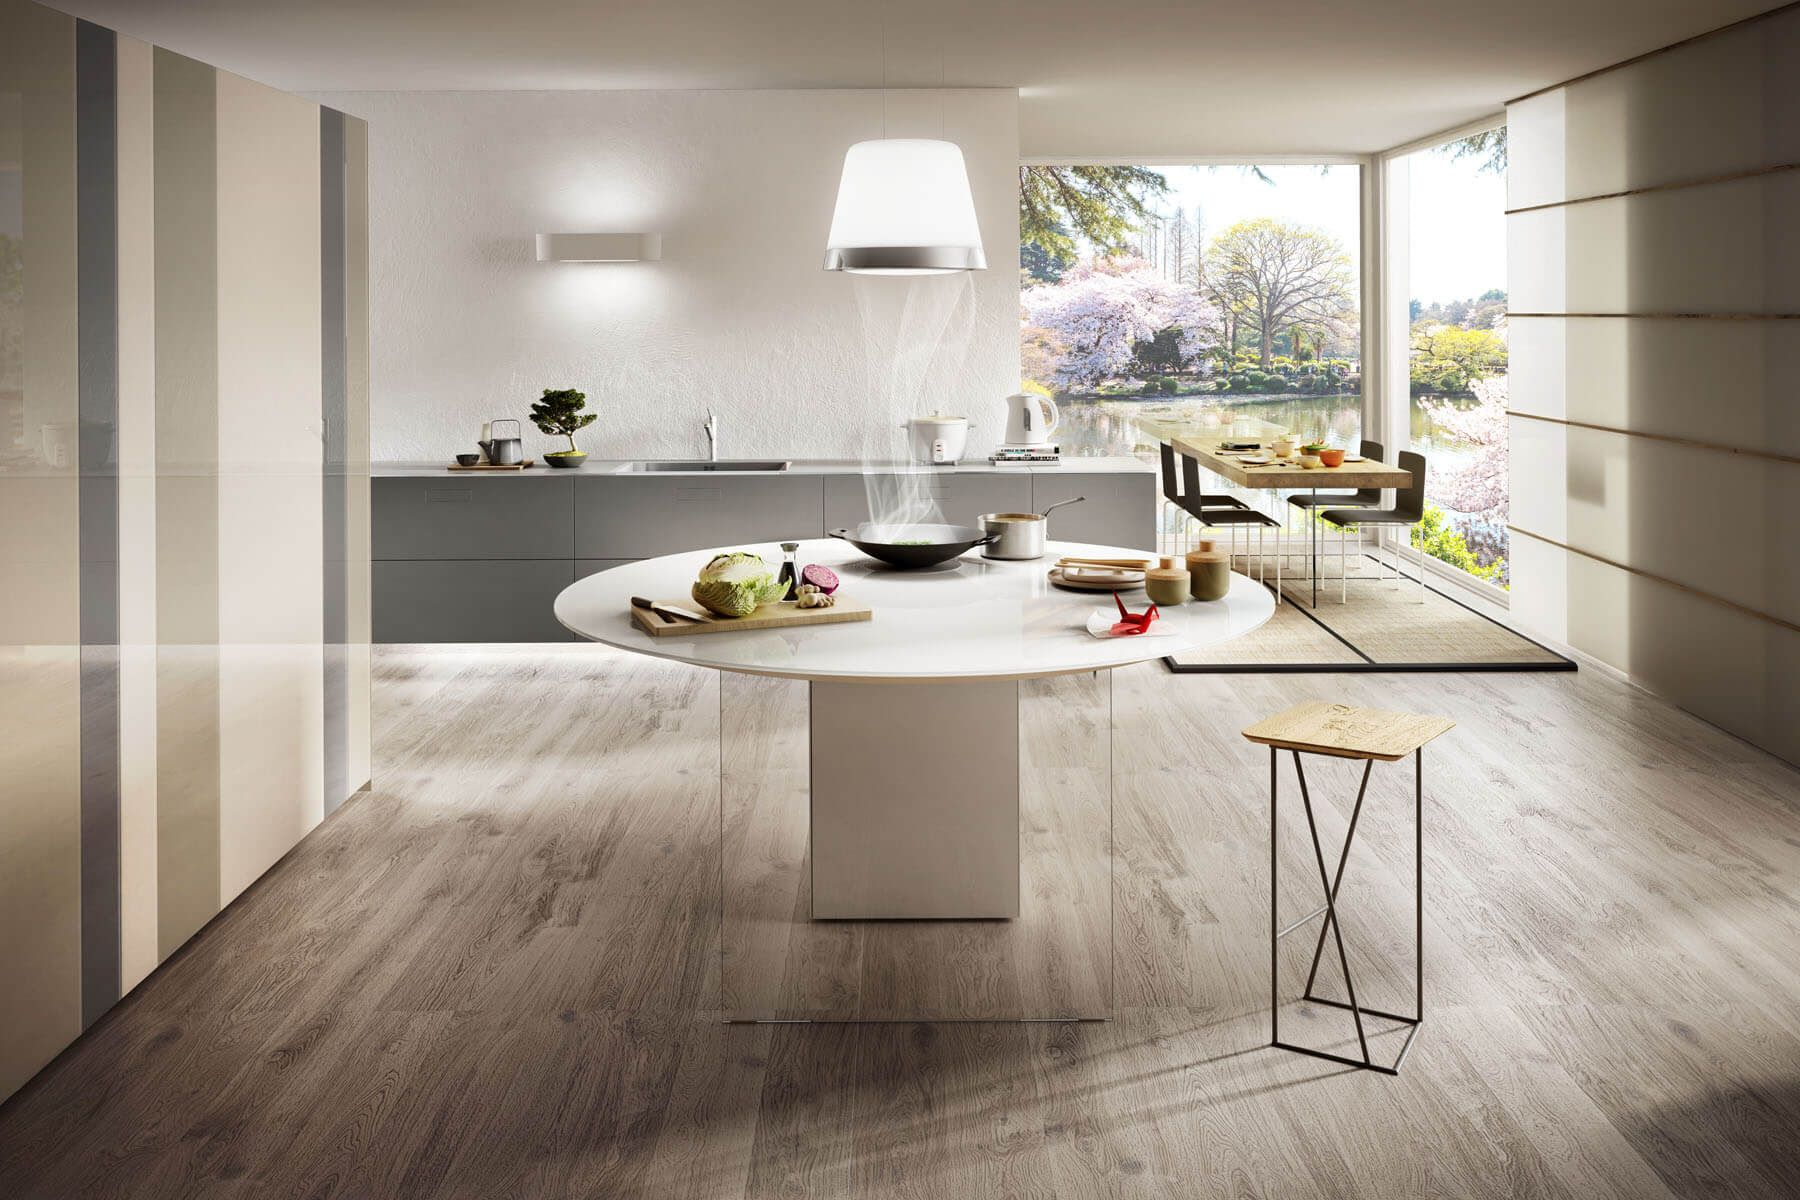 Cucine moderne componibili di design | #kitchen 廚房 ...